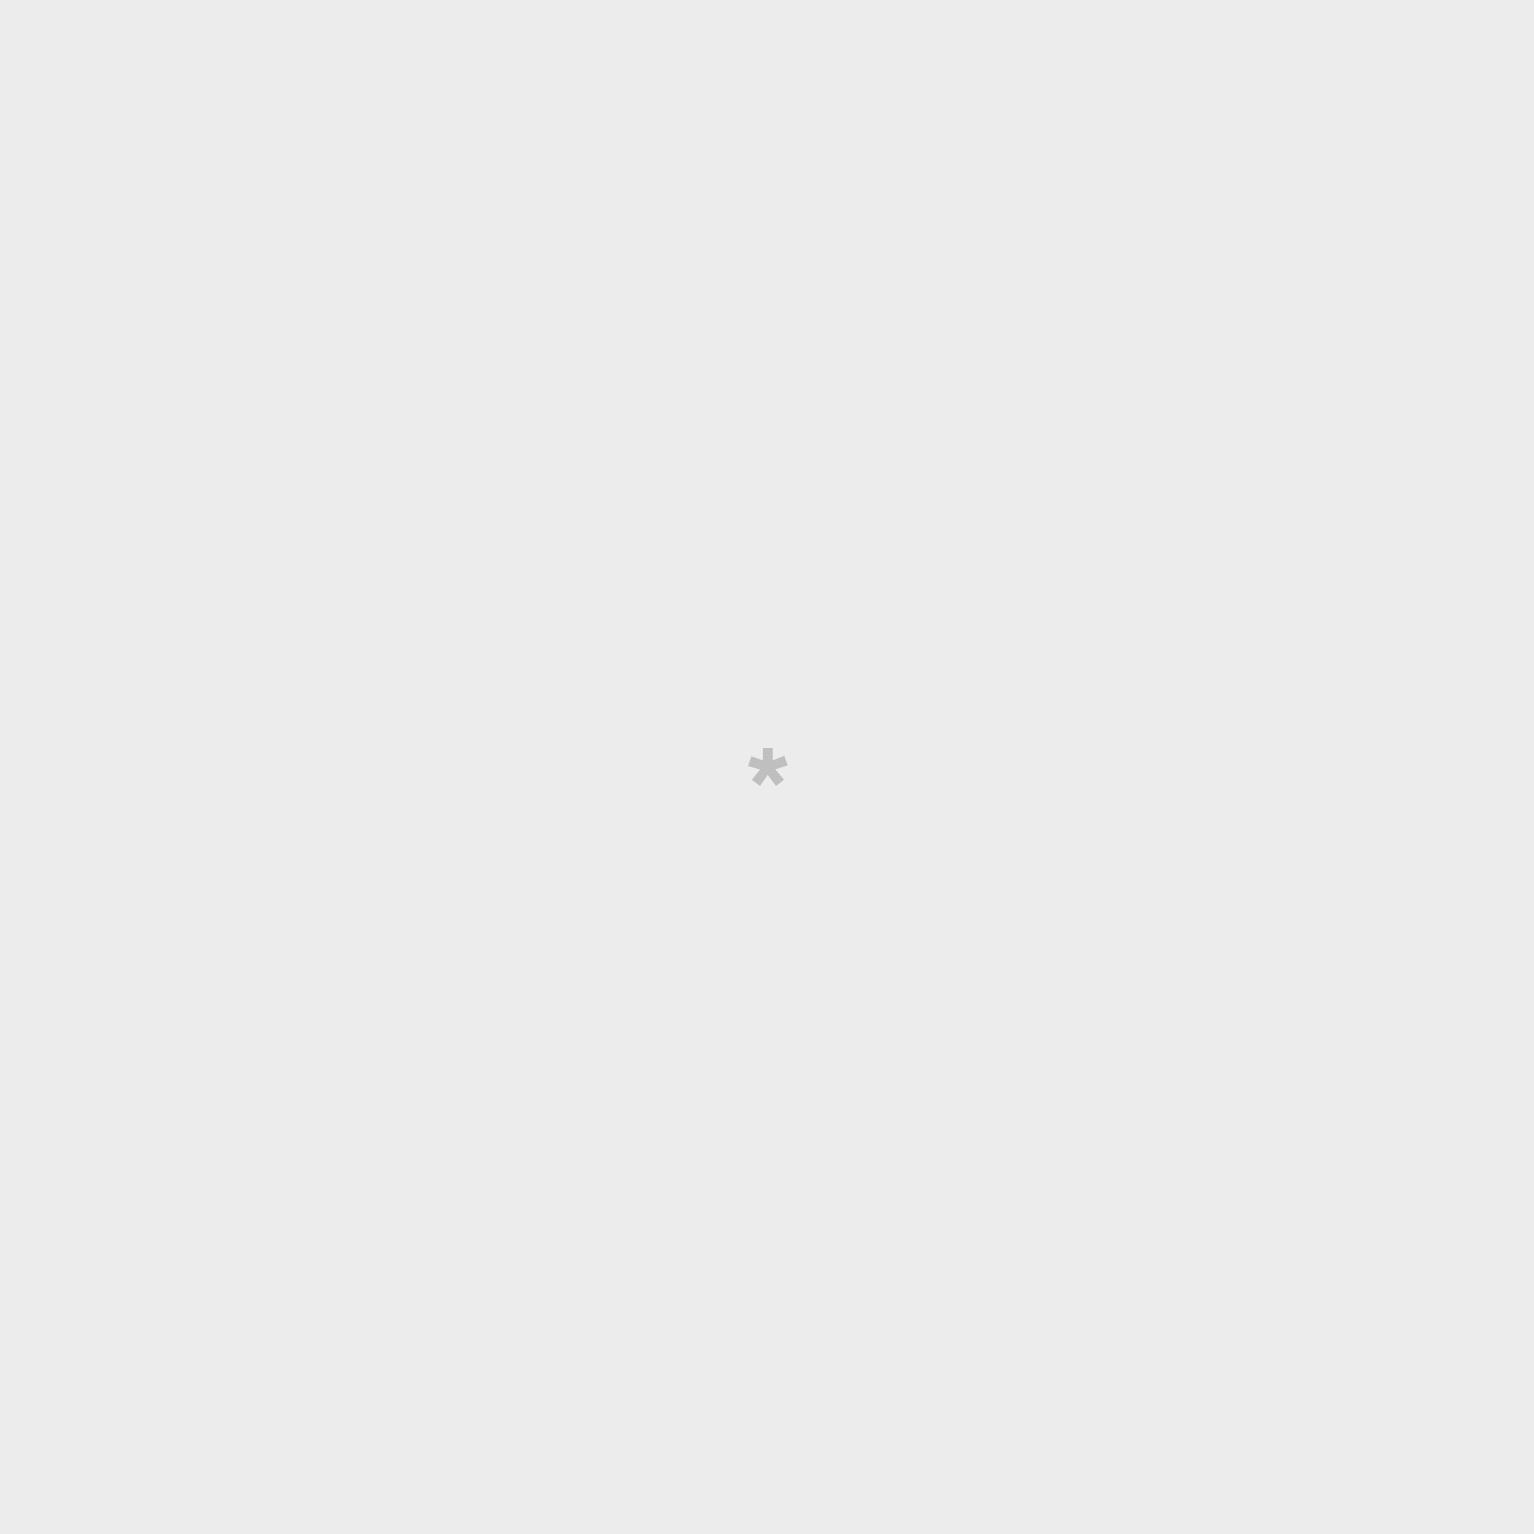 Beach towel - Don't worry beach happyy